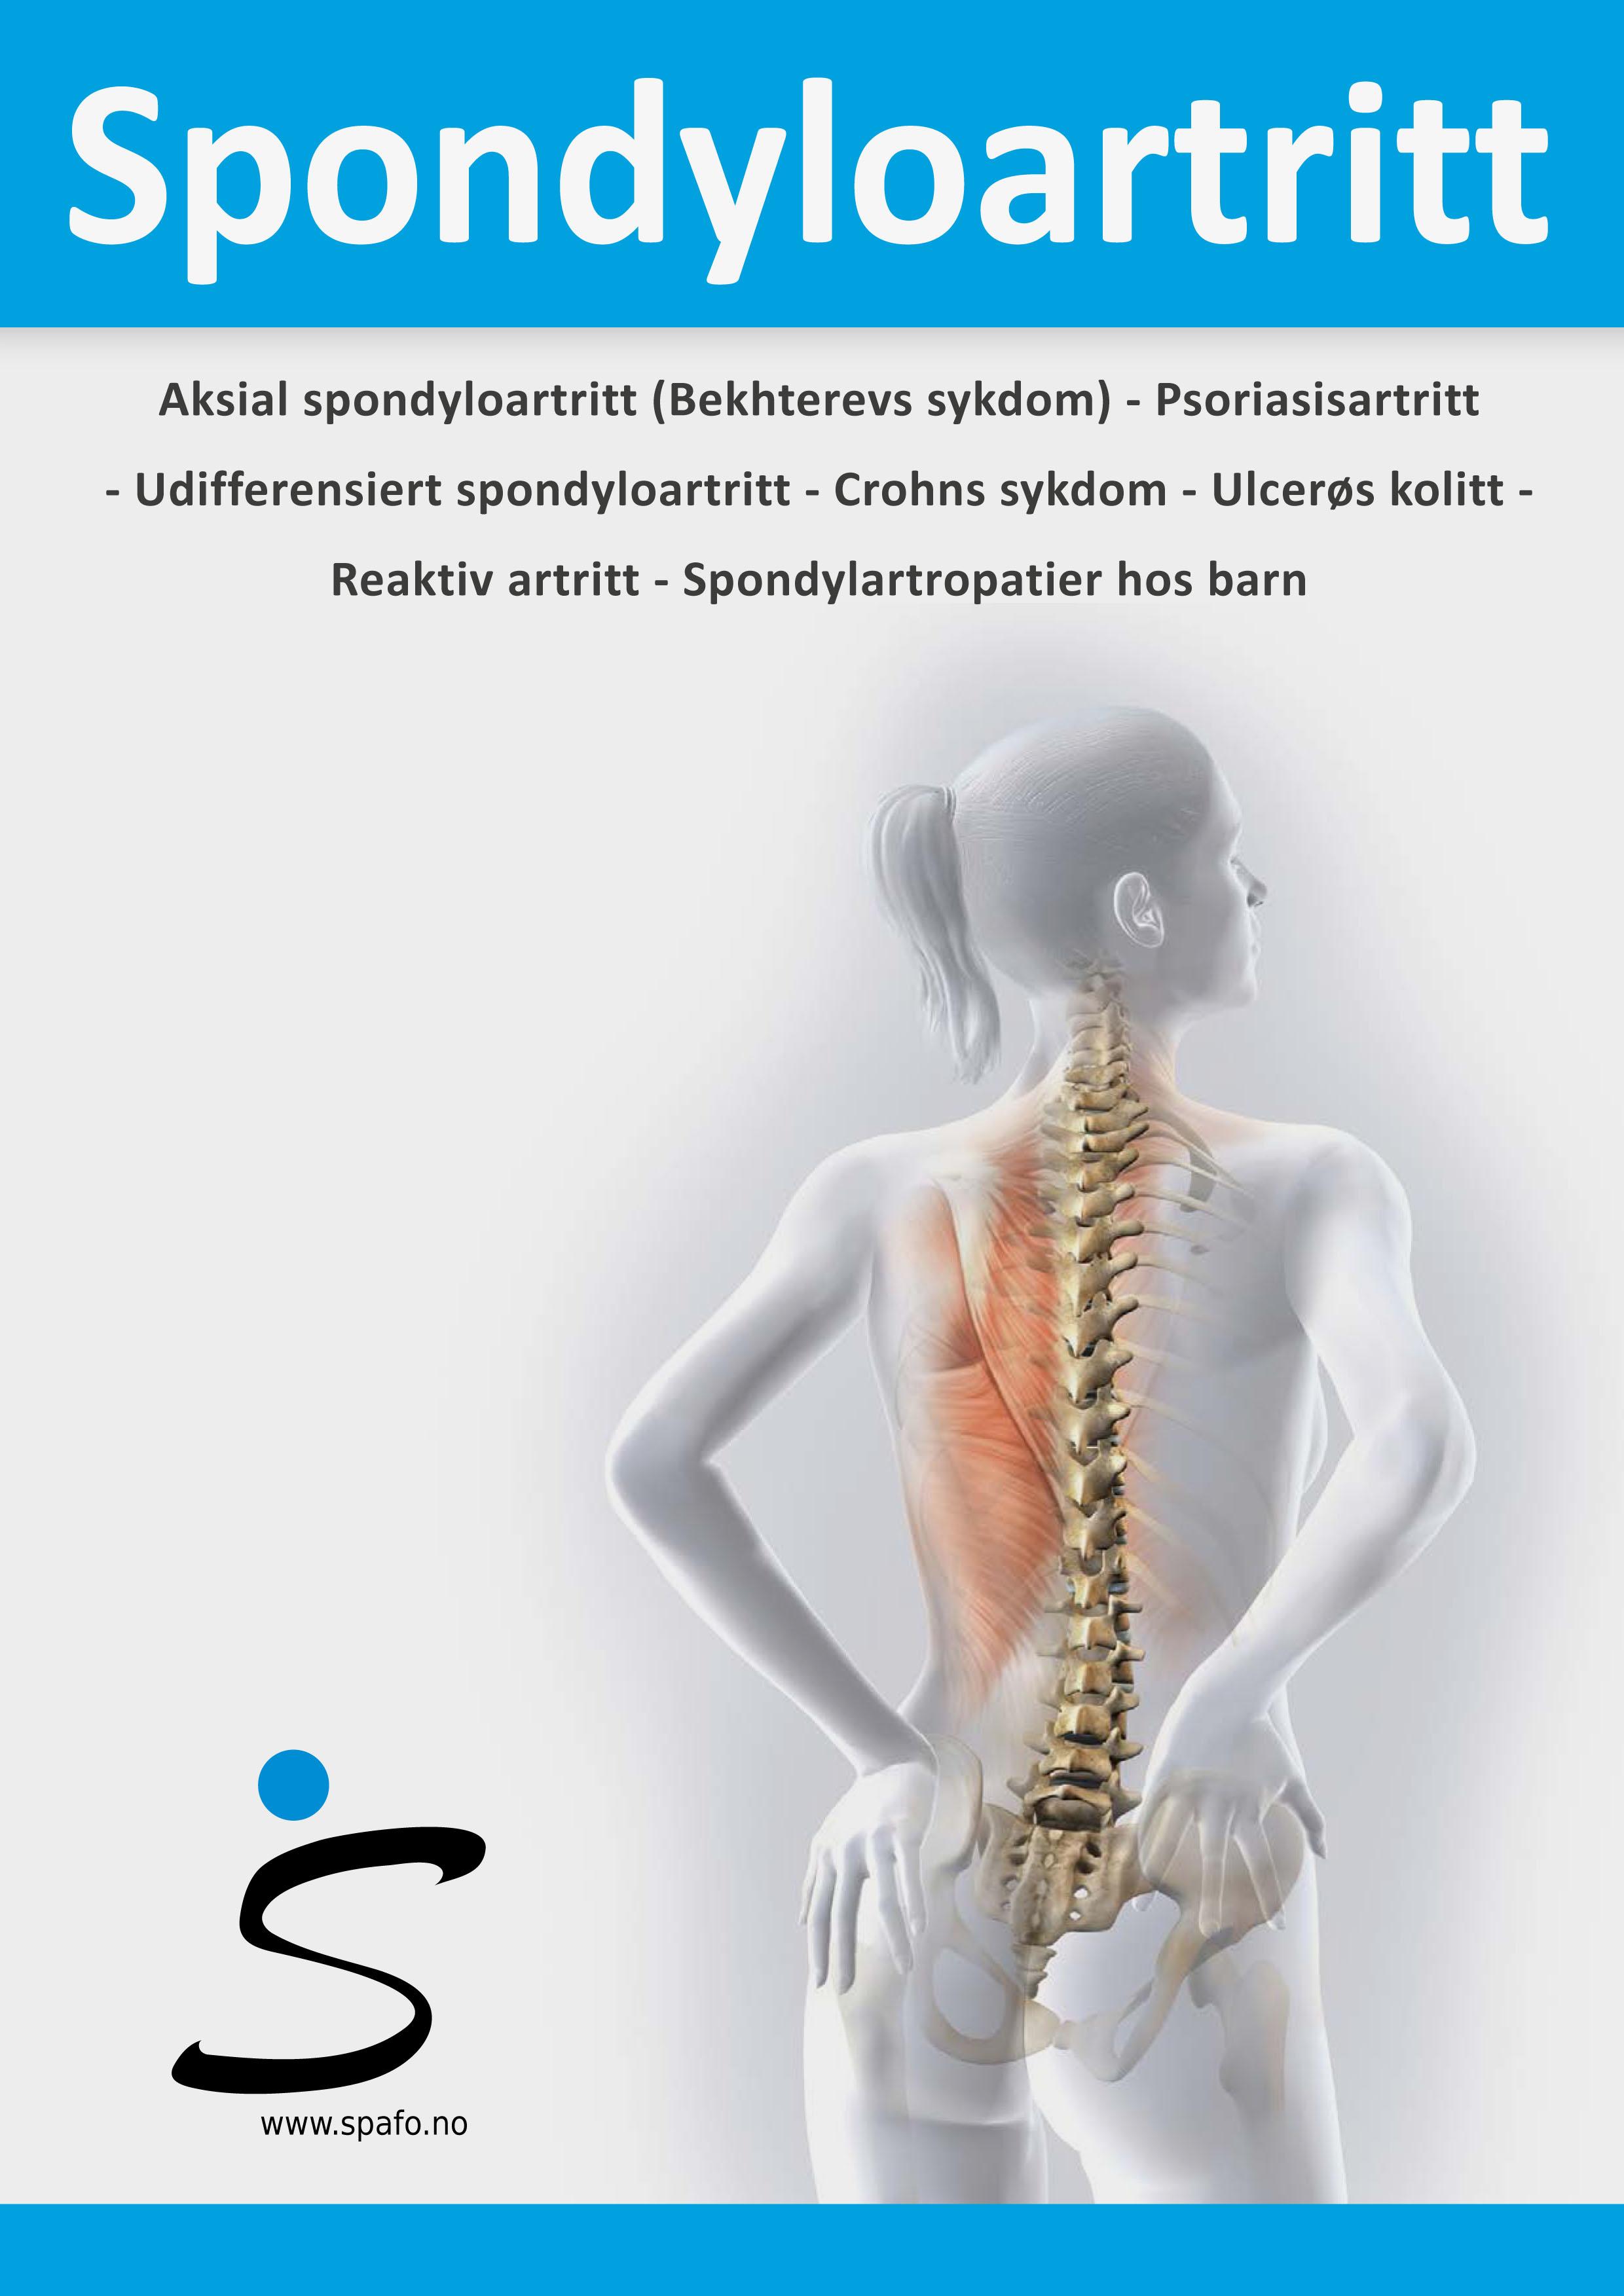 Symptomer Psoriasisartritt